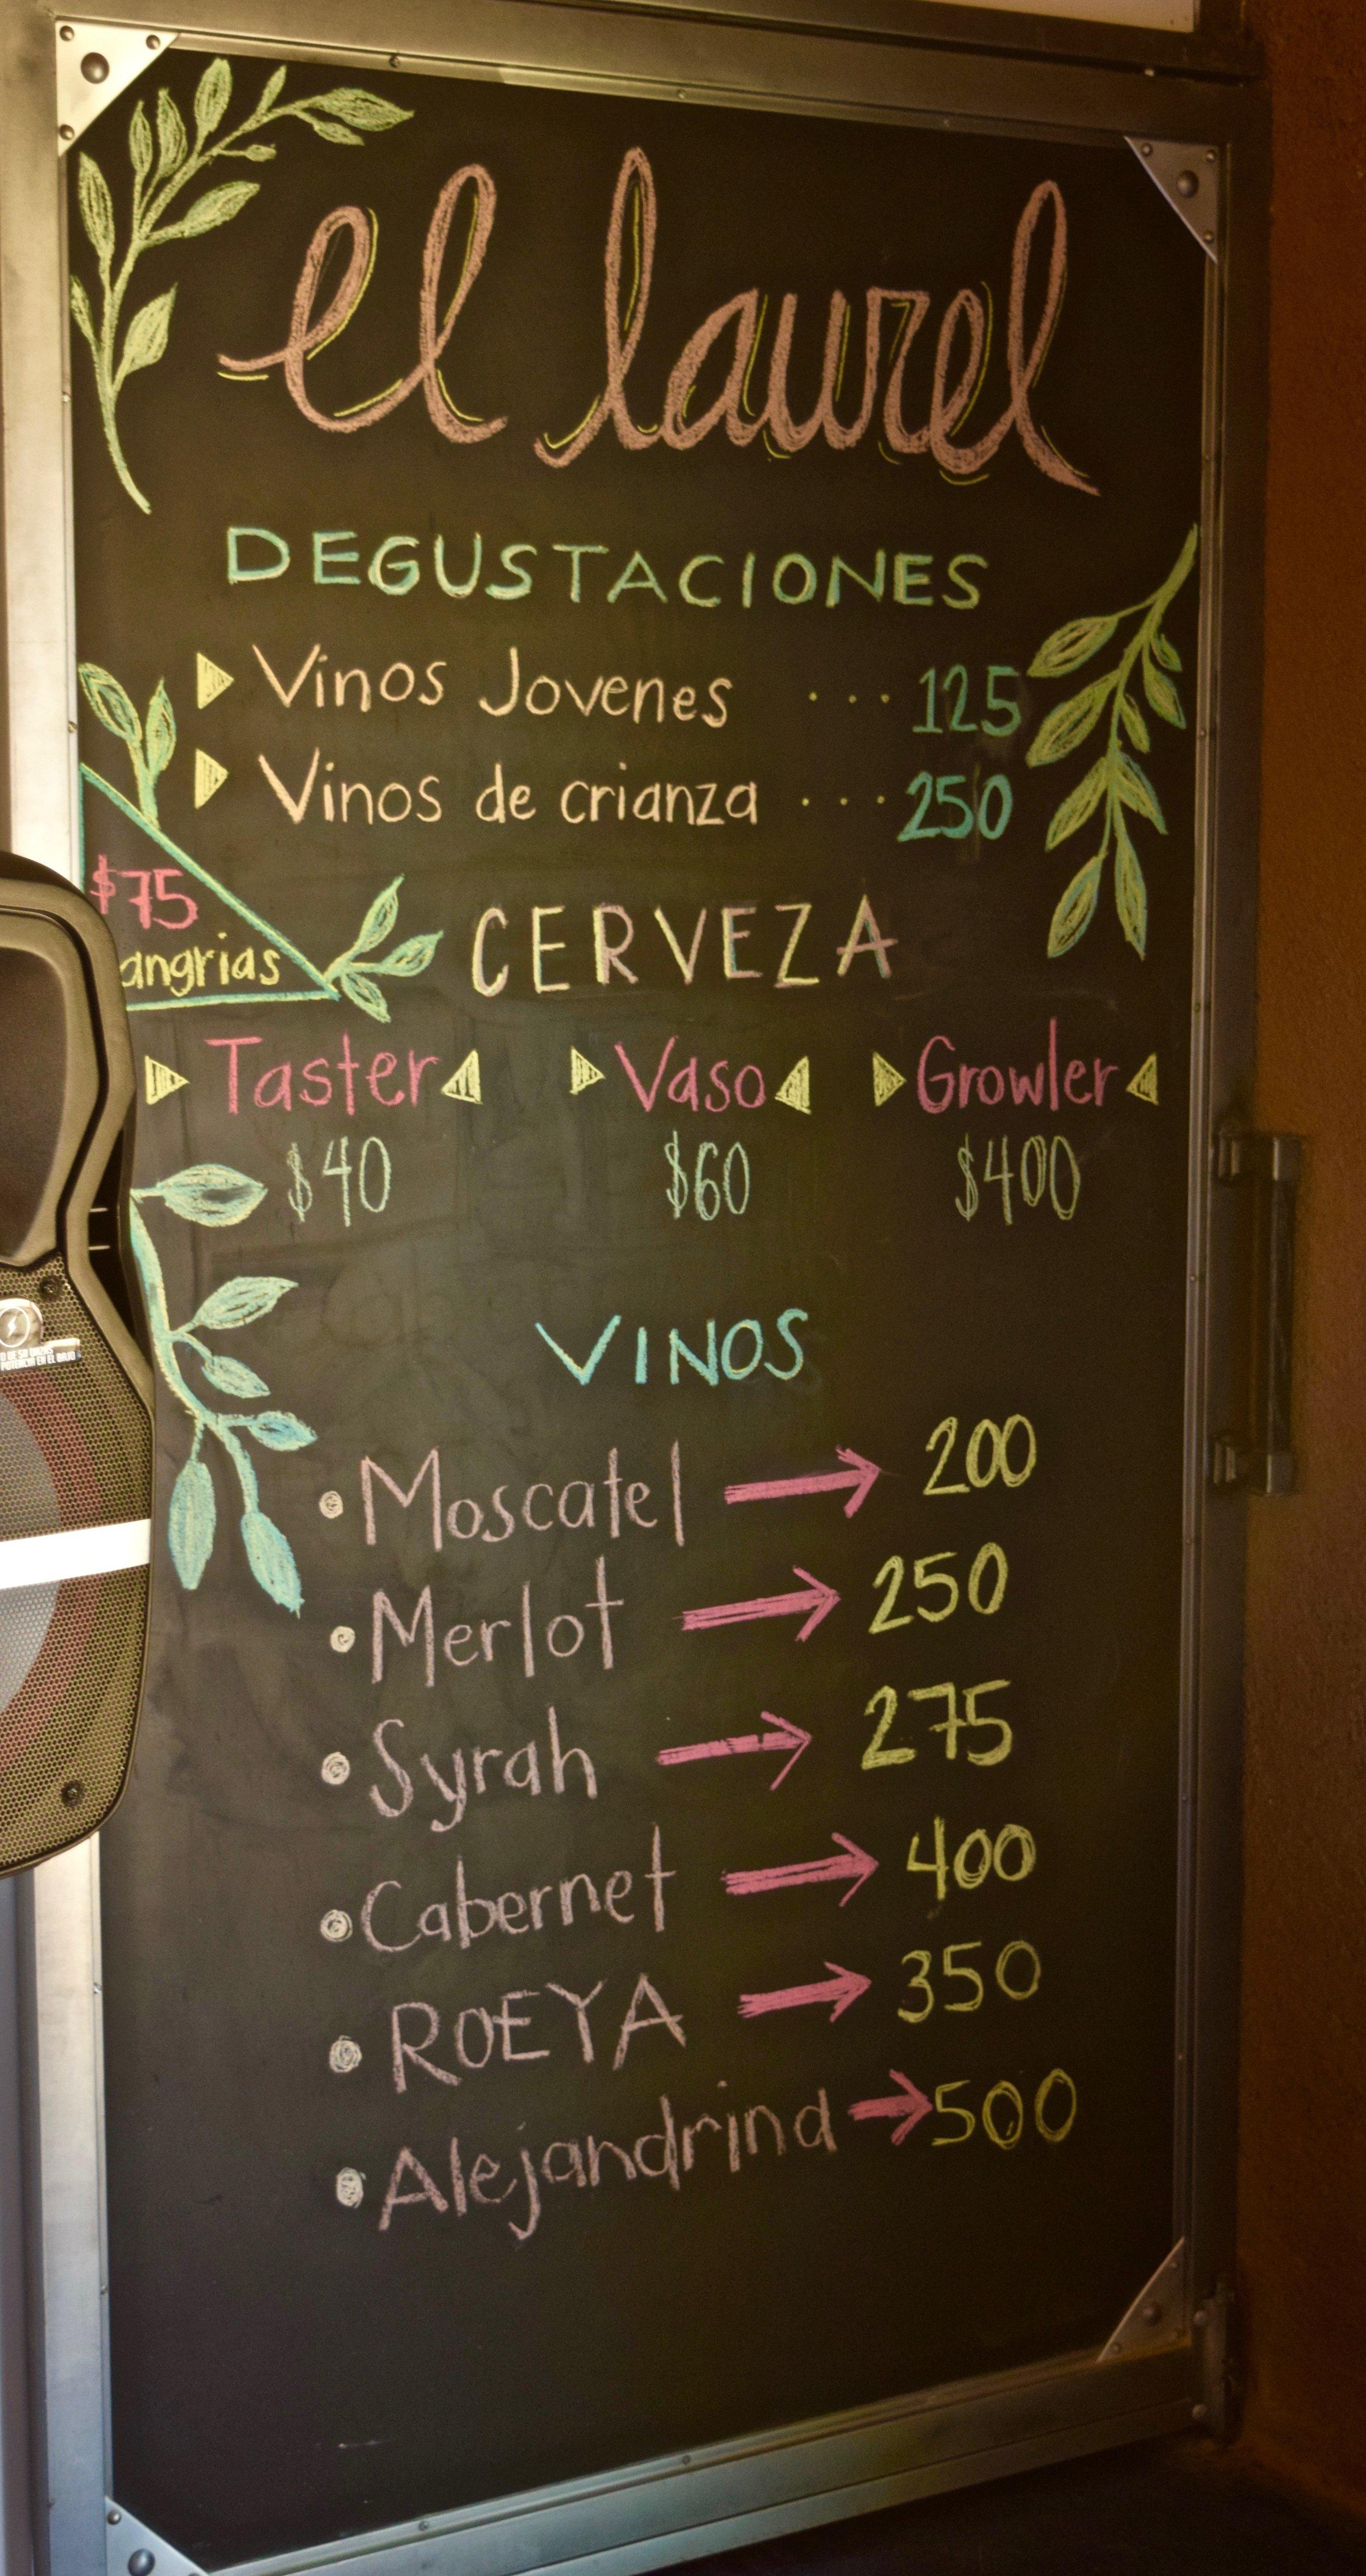 el laurel- sign with prices.jpg